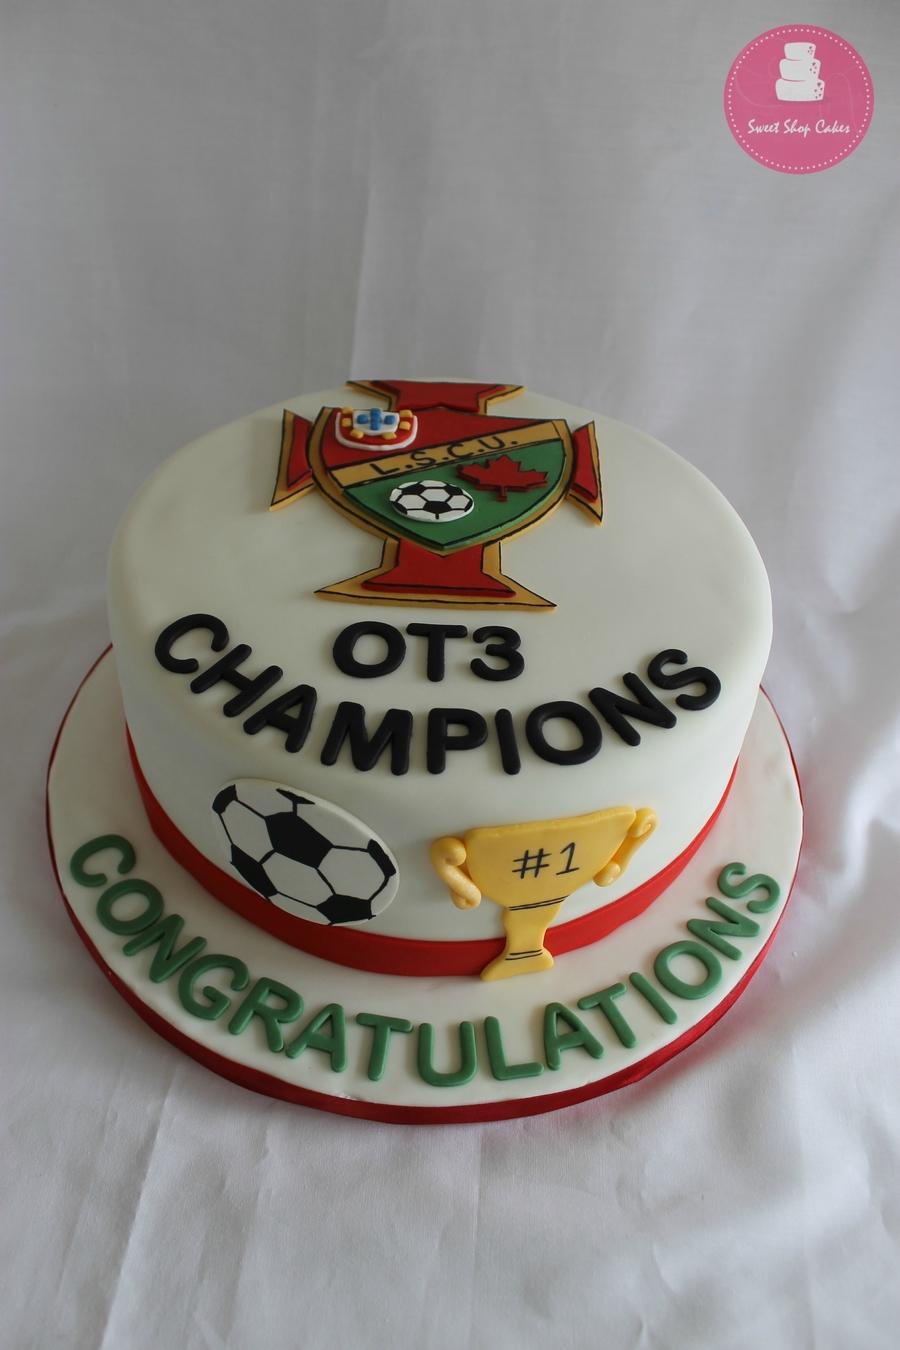 4CgJgnqK6a-soccer-champions-cake_900.jpg